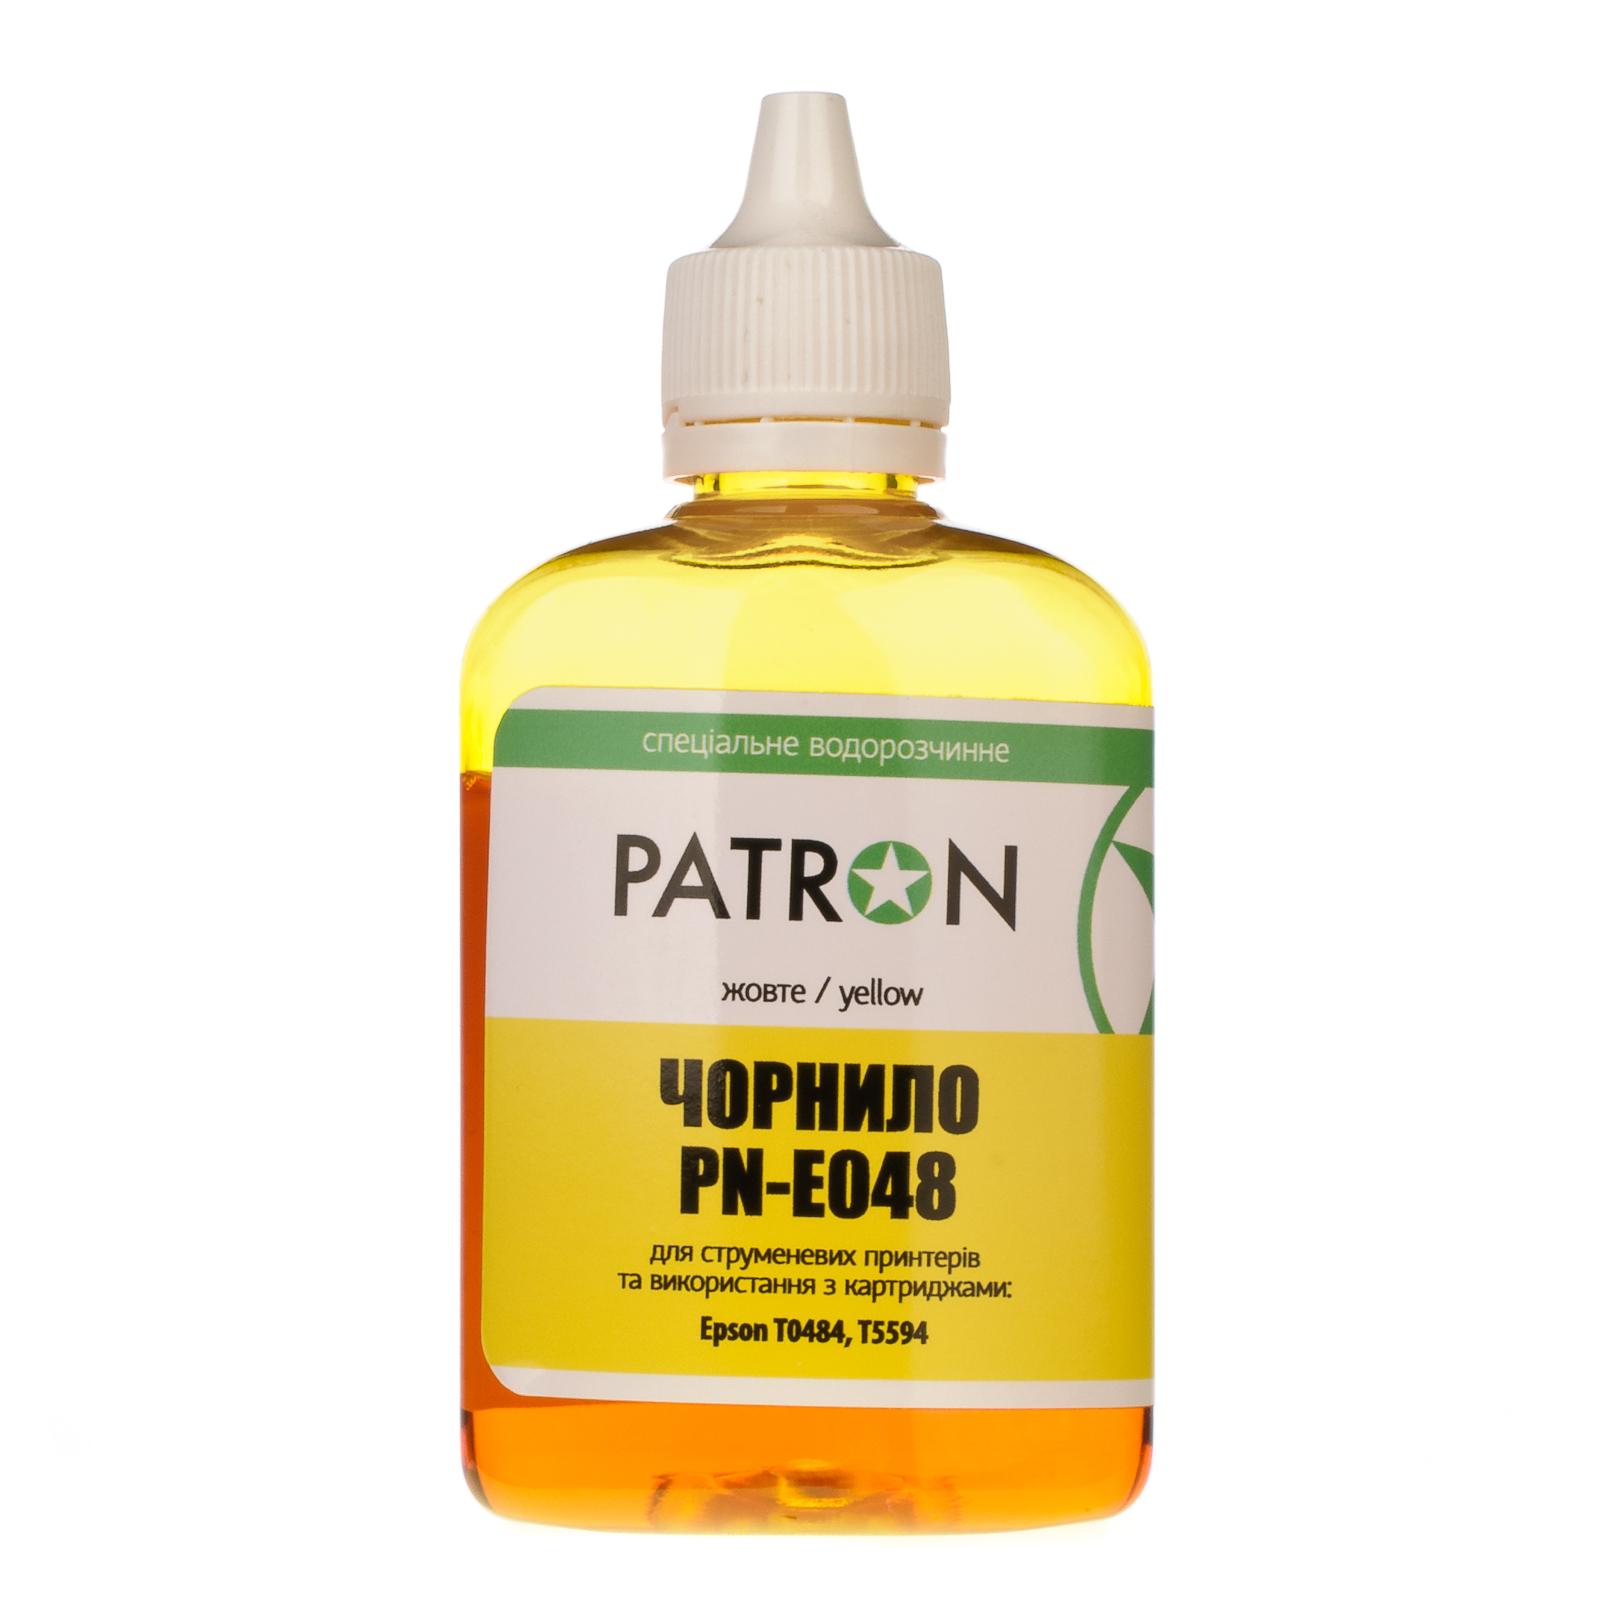 Чернила PATRON EPSON R220/90г YELLOW/T0484/PN-E048-305 (I-PN-ET0484-090-Y) изображение 2